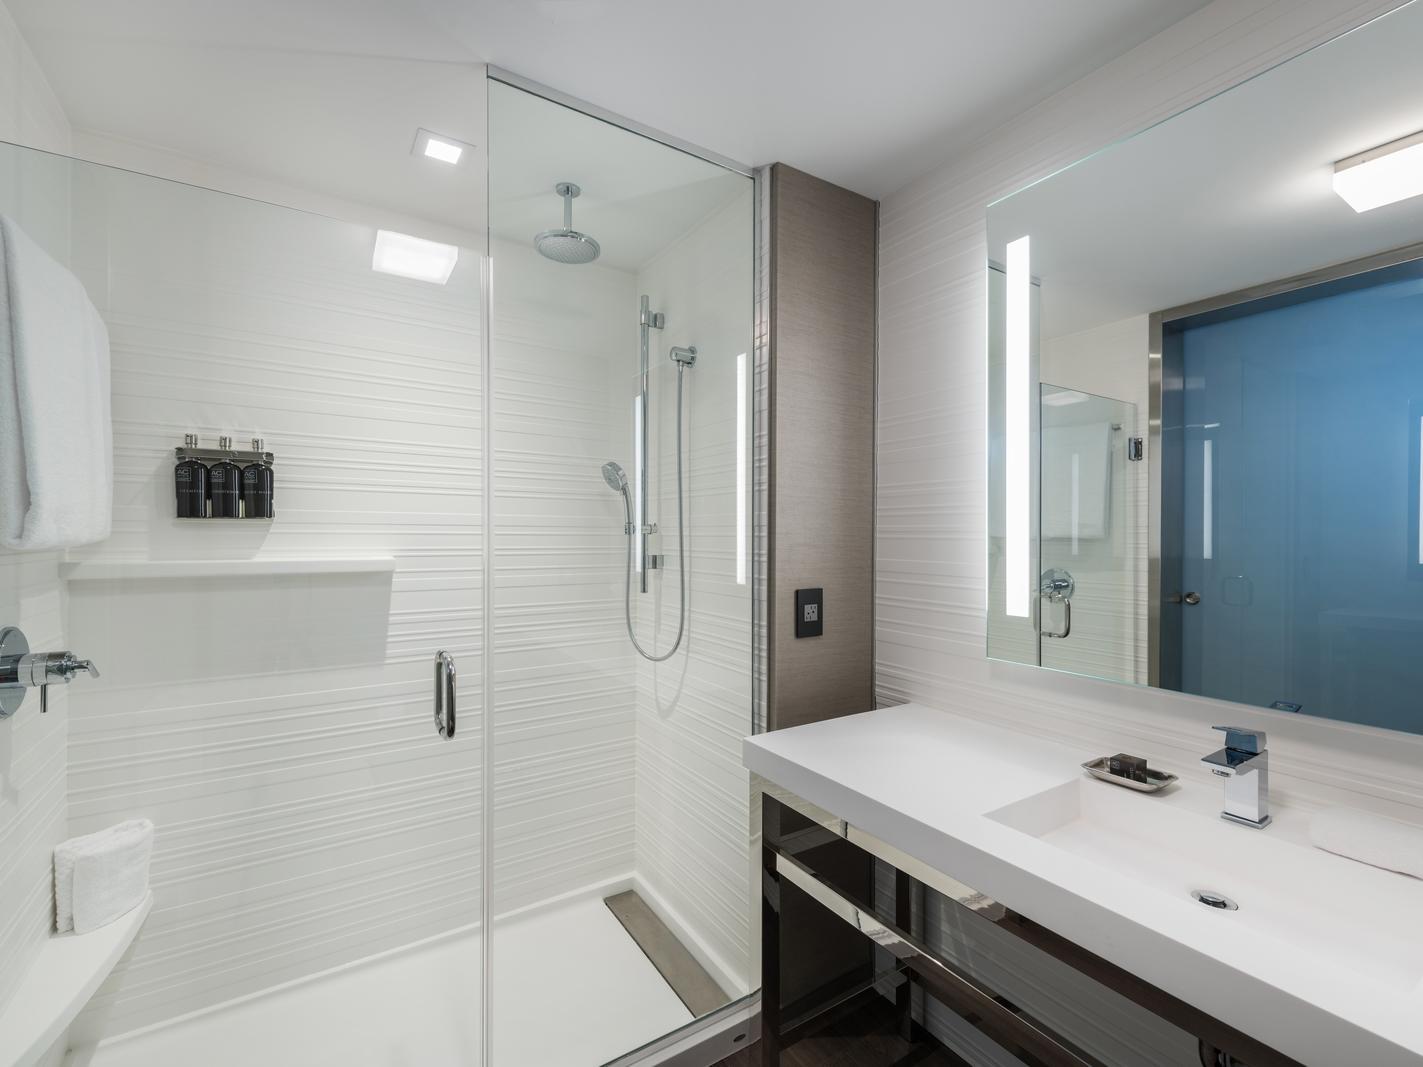 Vanity and walk in shower